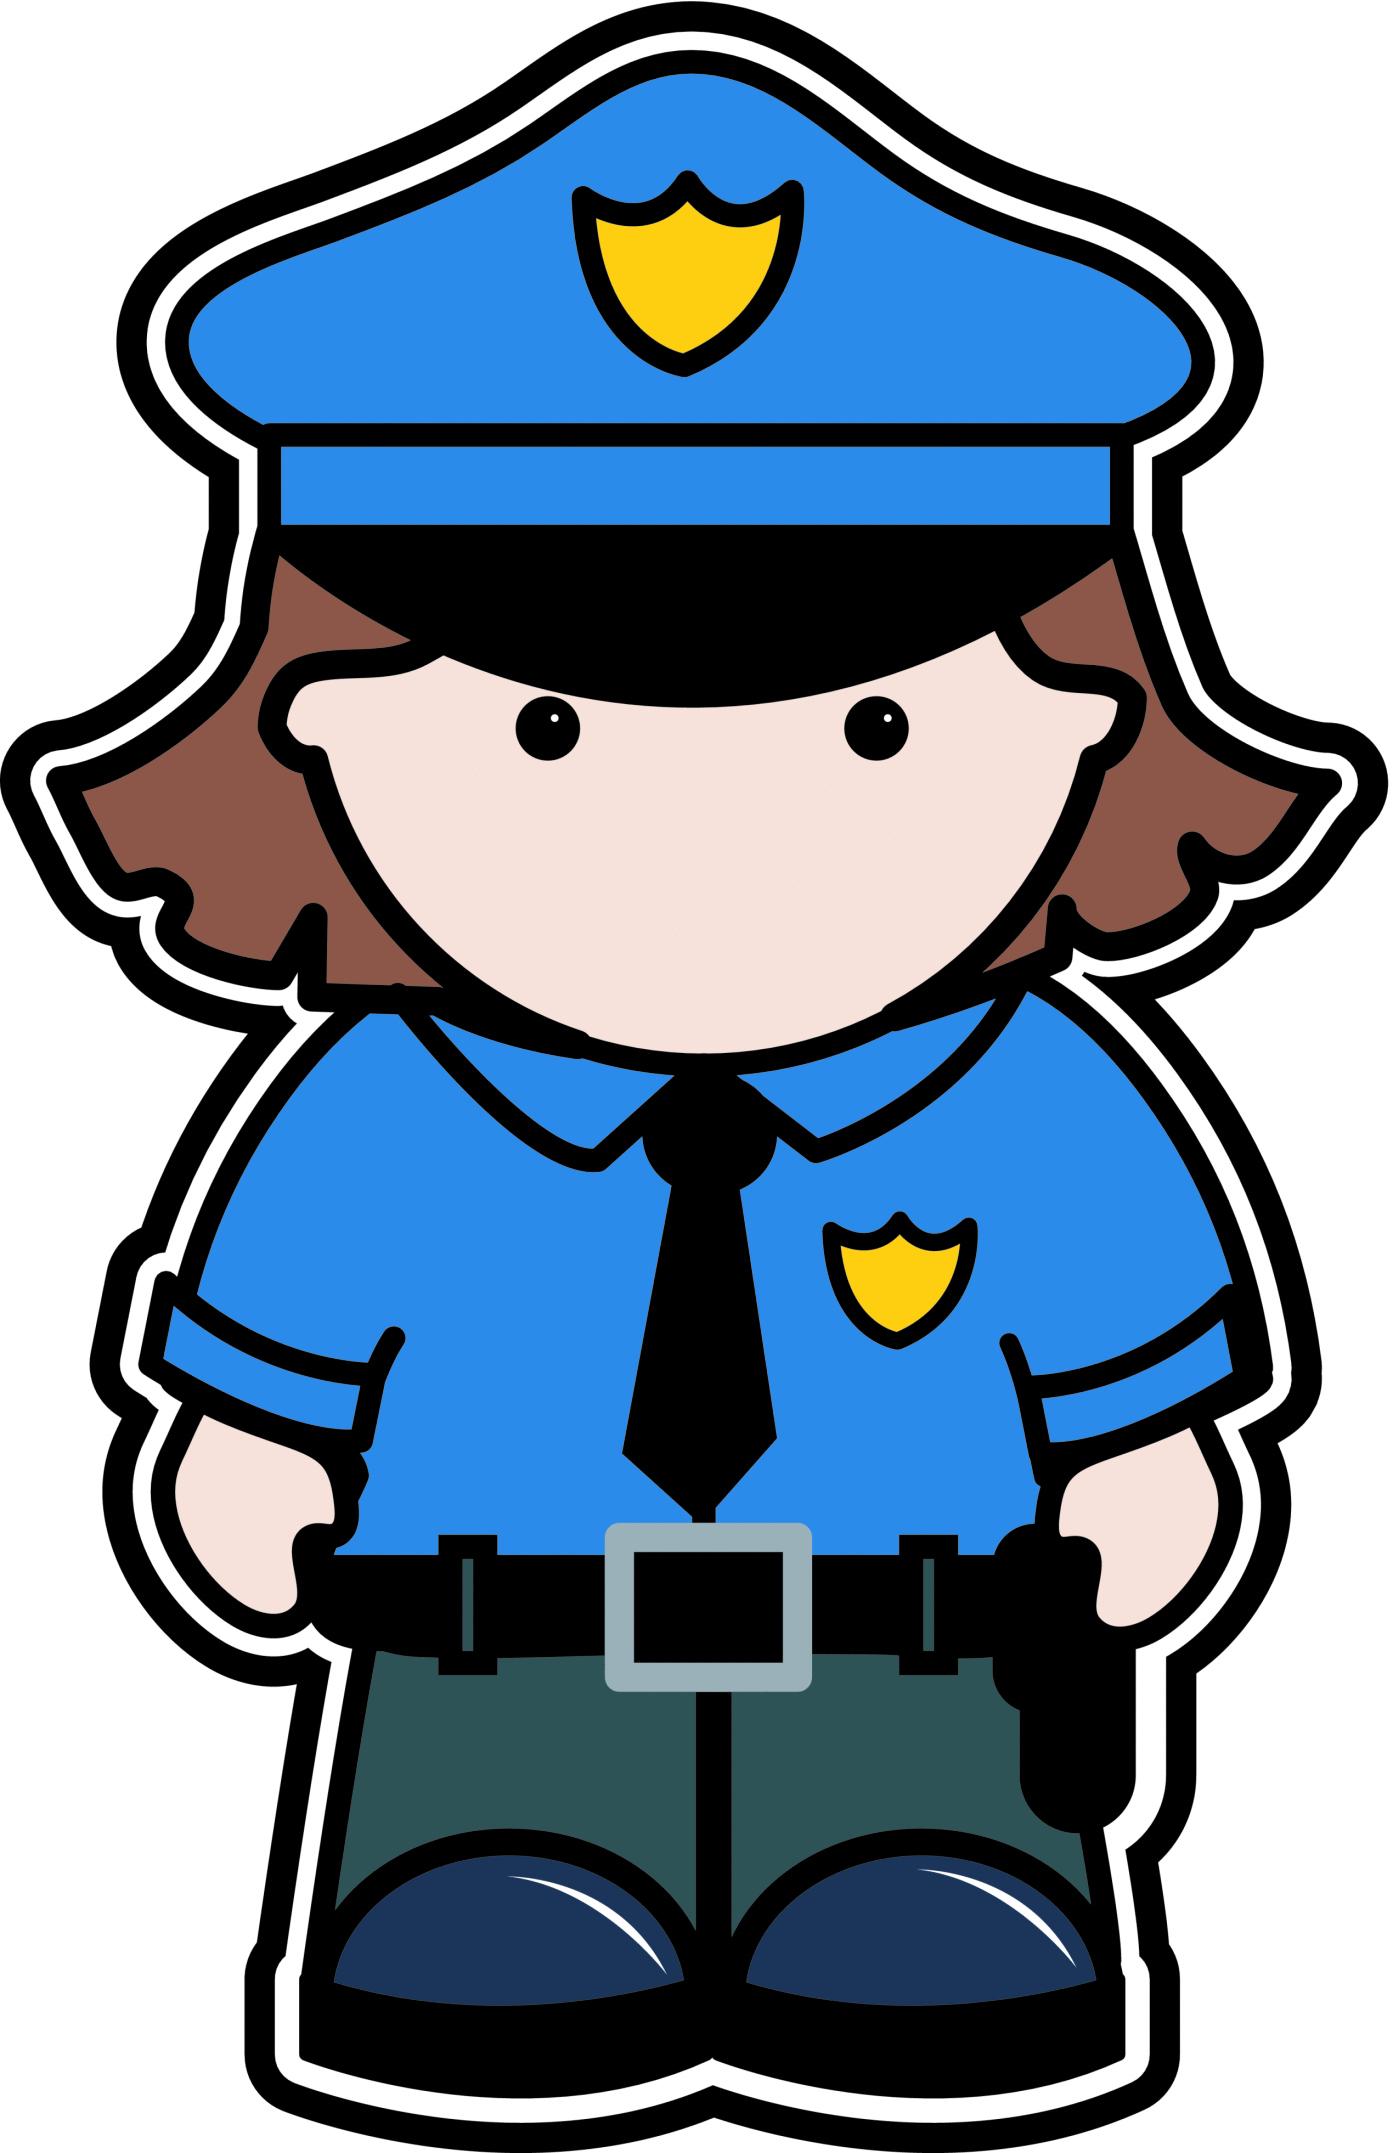 Female cop clipart.